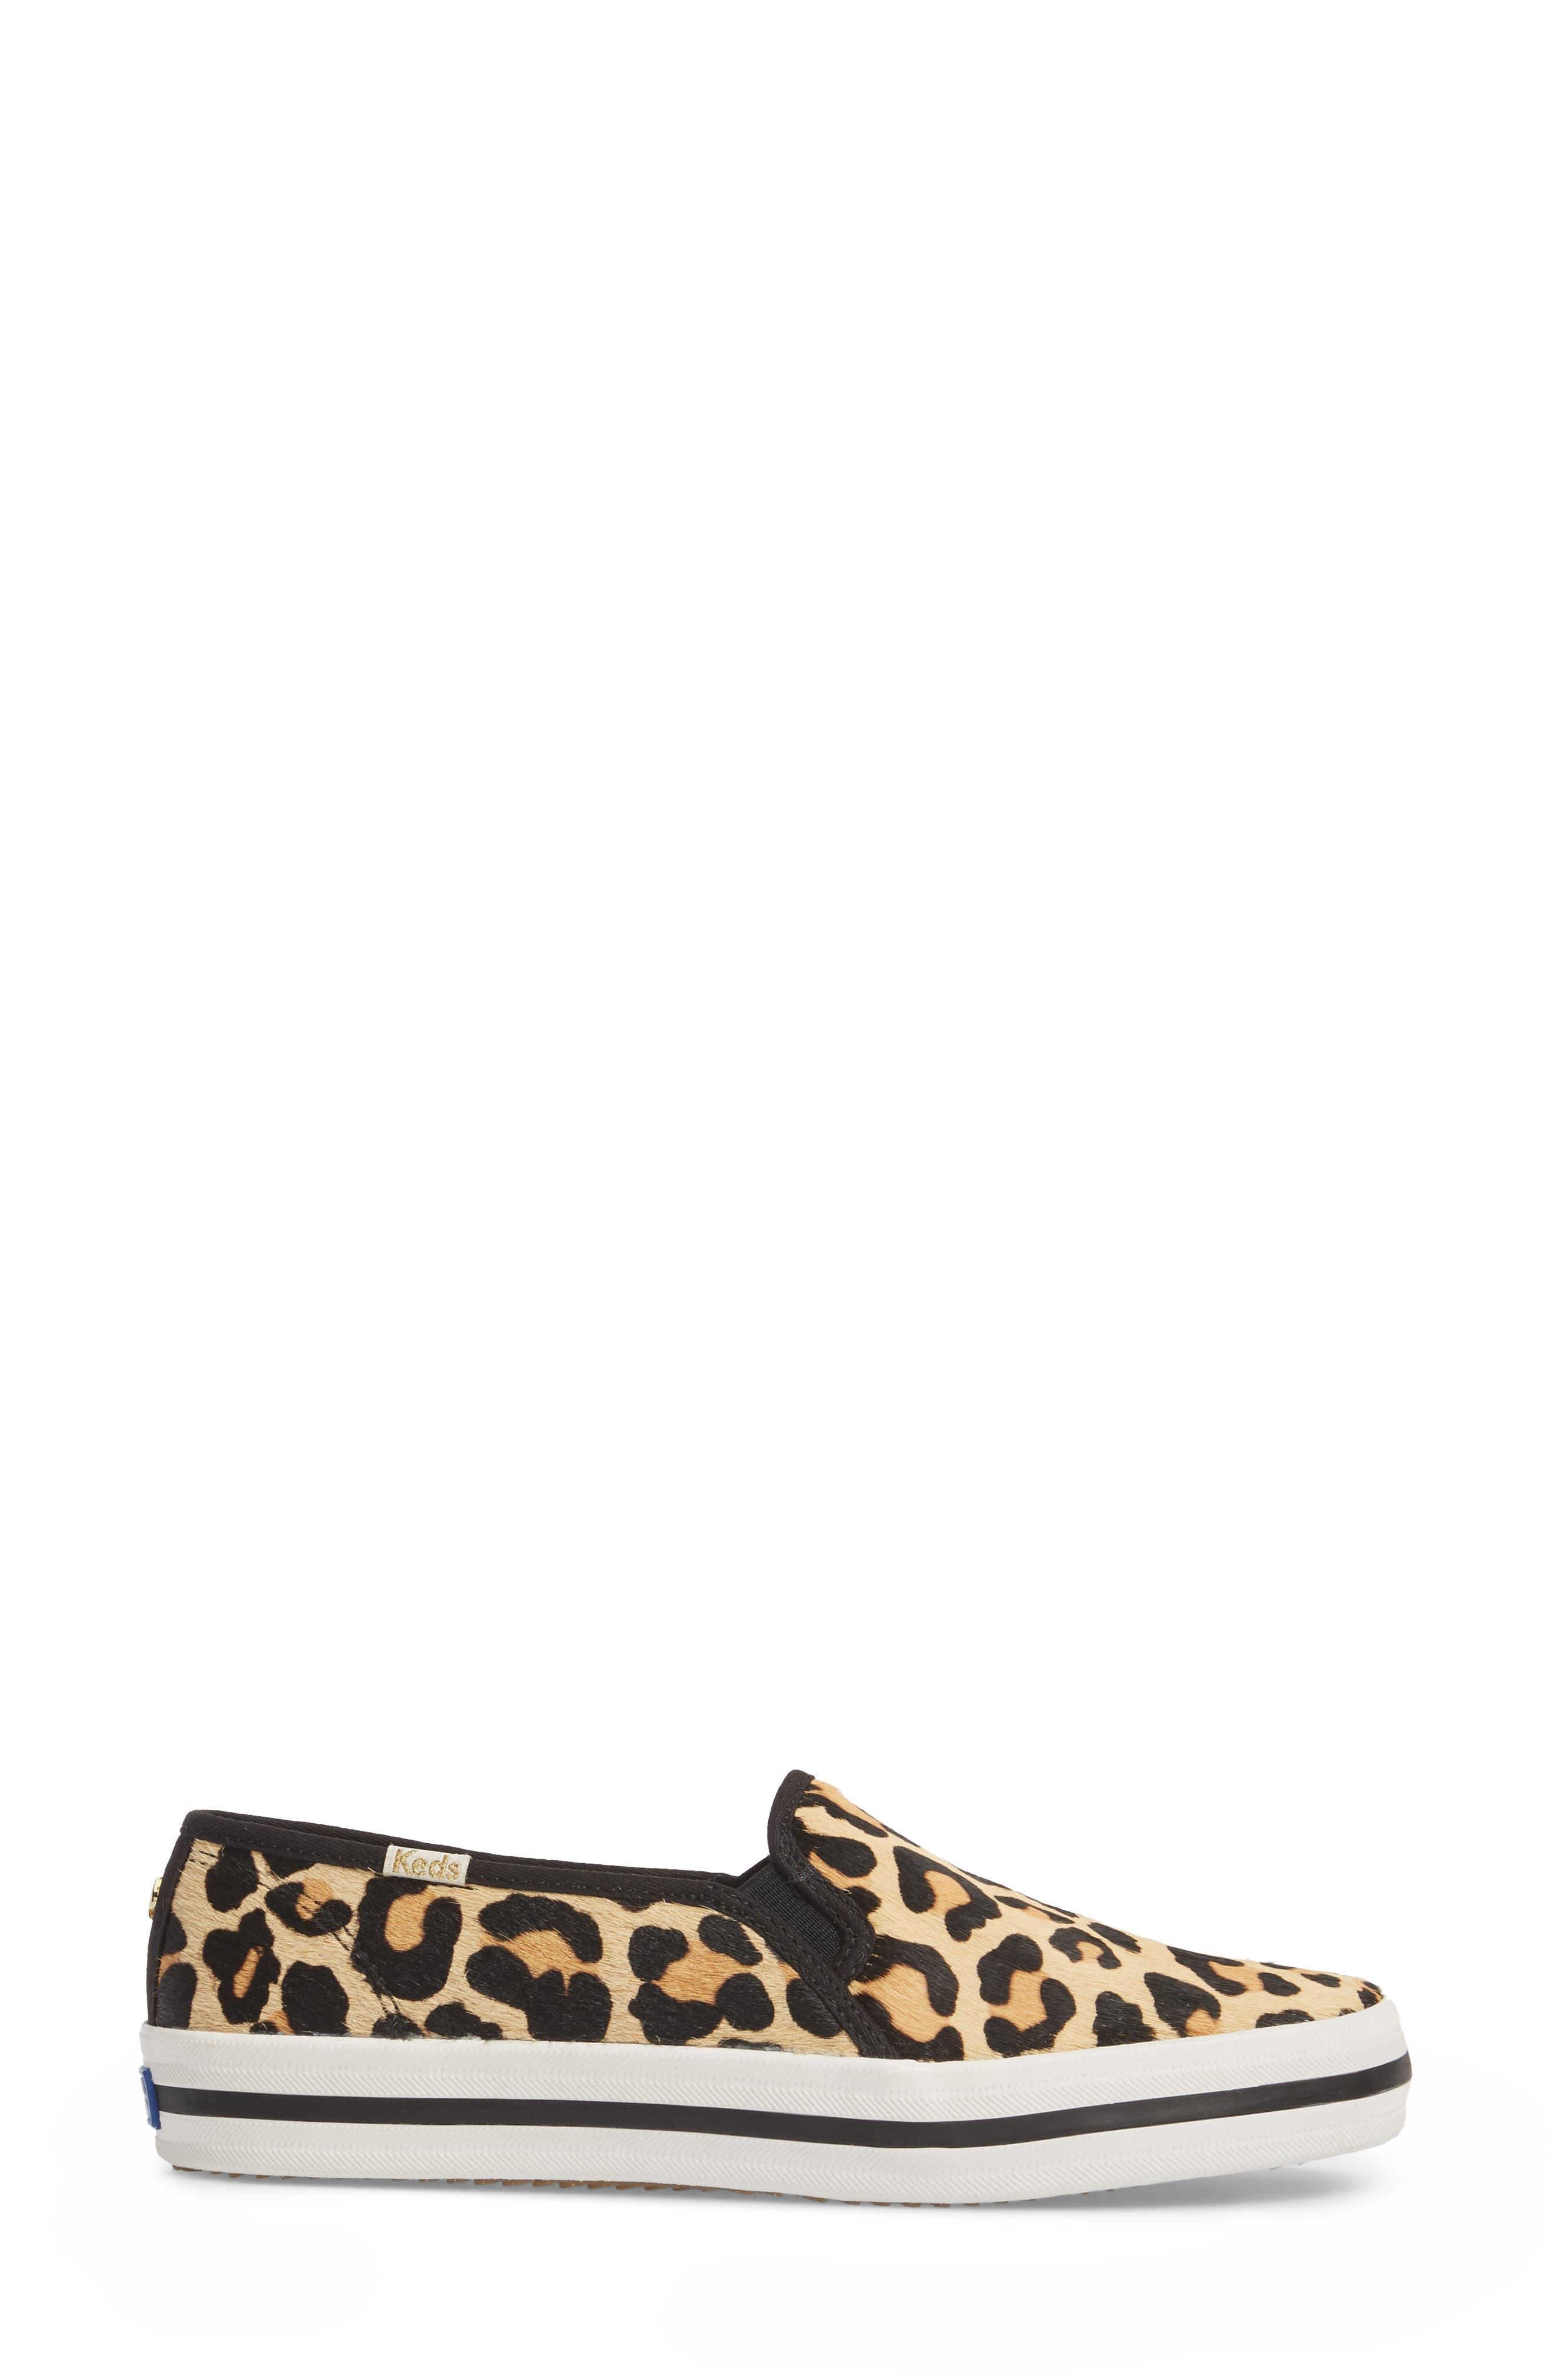 Keds<sup>®</sup> x kate spade Double Decker Slip-On Sneaker,                             Alternate thumbnail 3, color,                             Tan Pony Hair